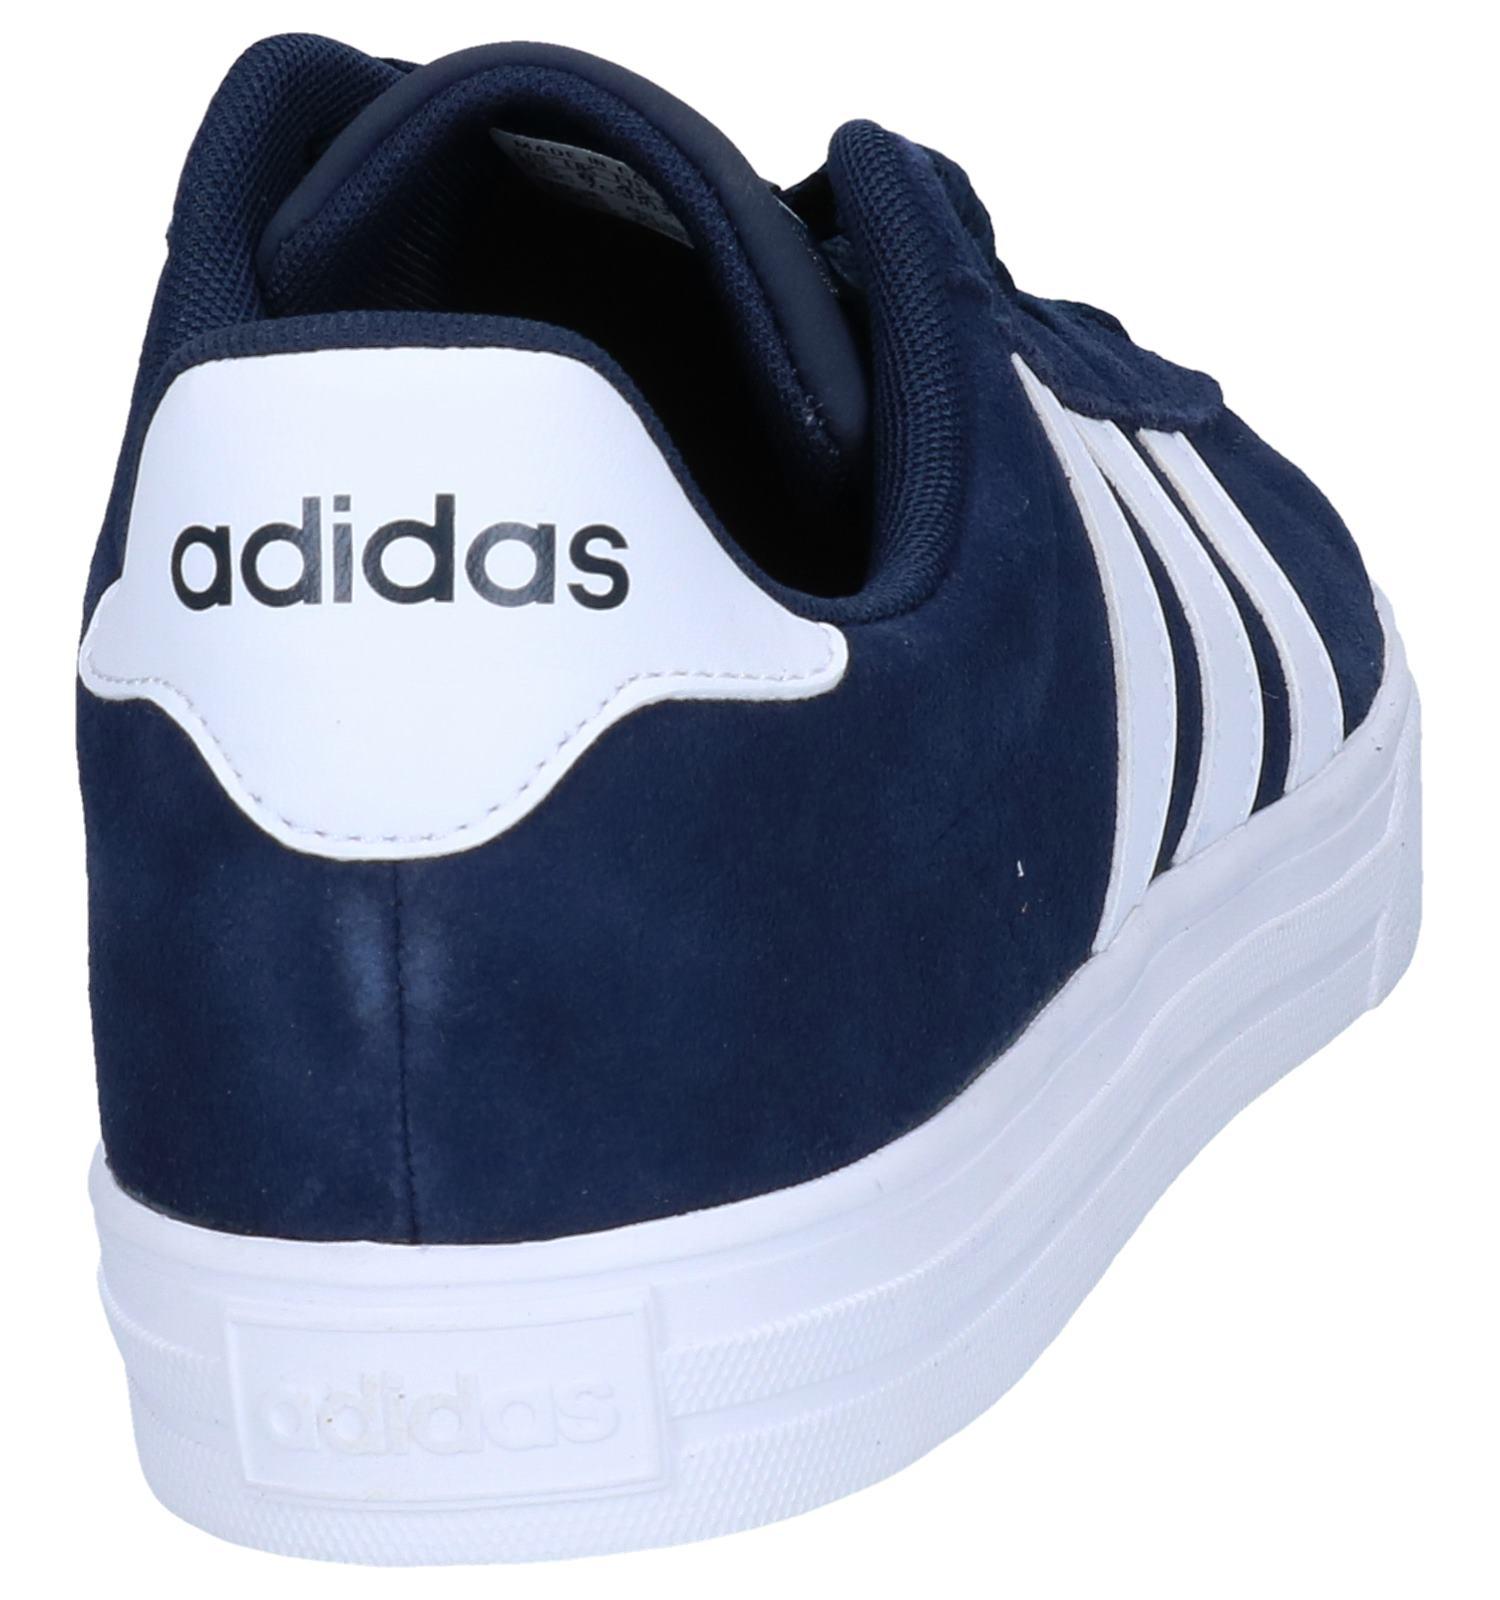 2 Adidas 0 Sneakers Blauwe Dialy Y6fvbg7y